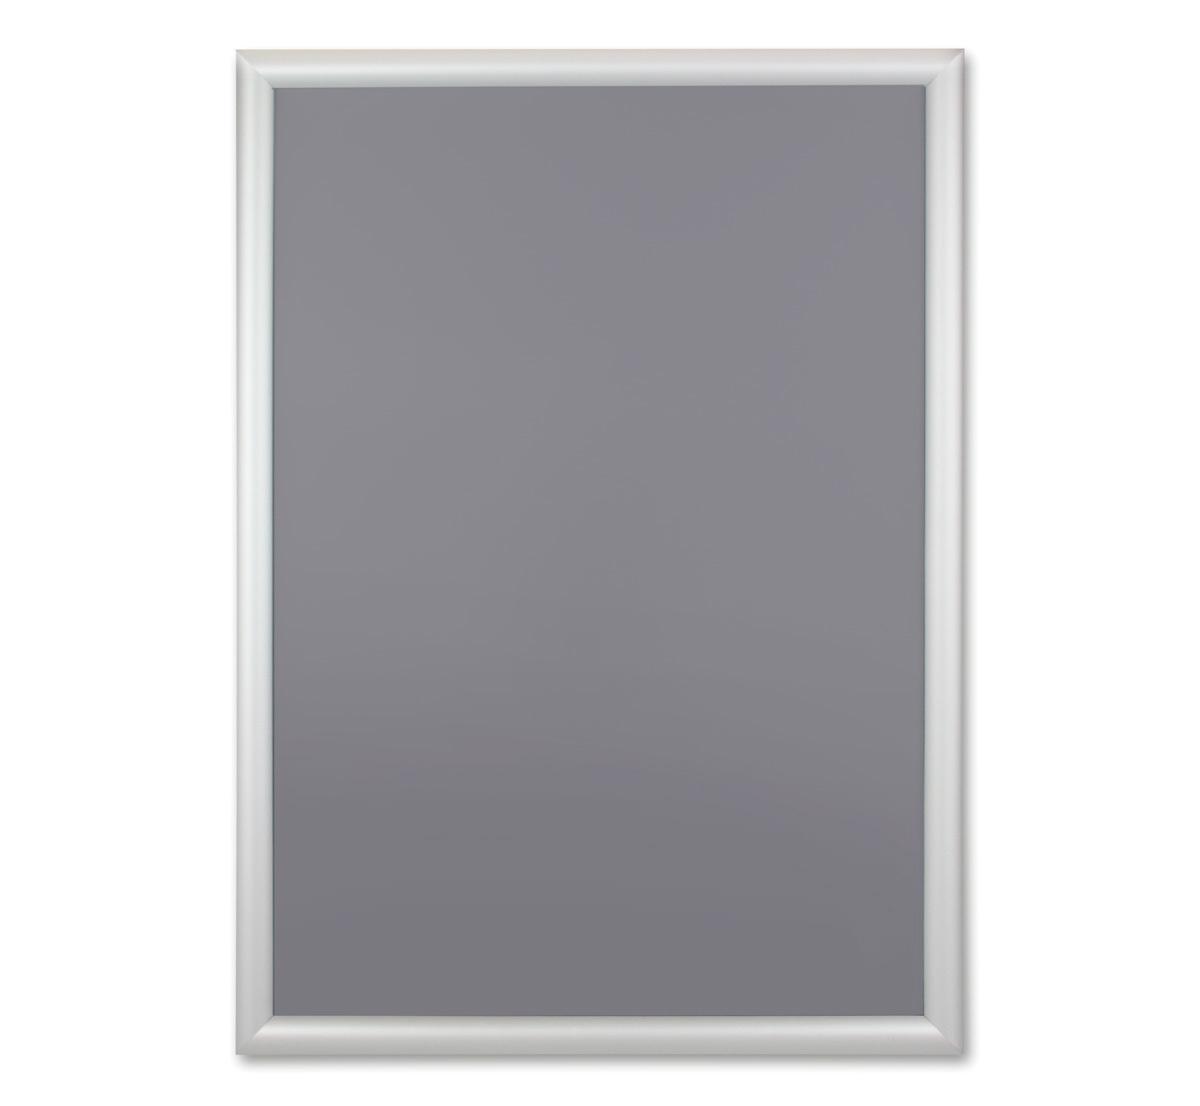 Ramka OWZ B3 plakatowa zatrzaskowa aluminiowa